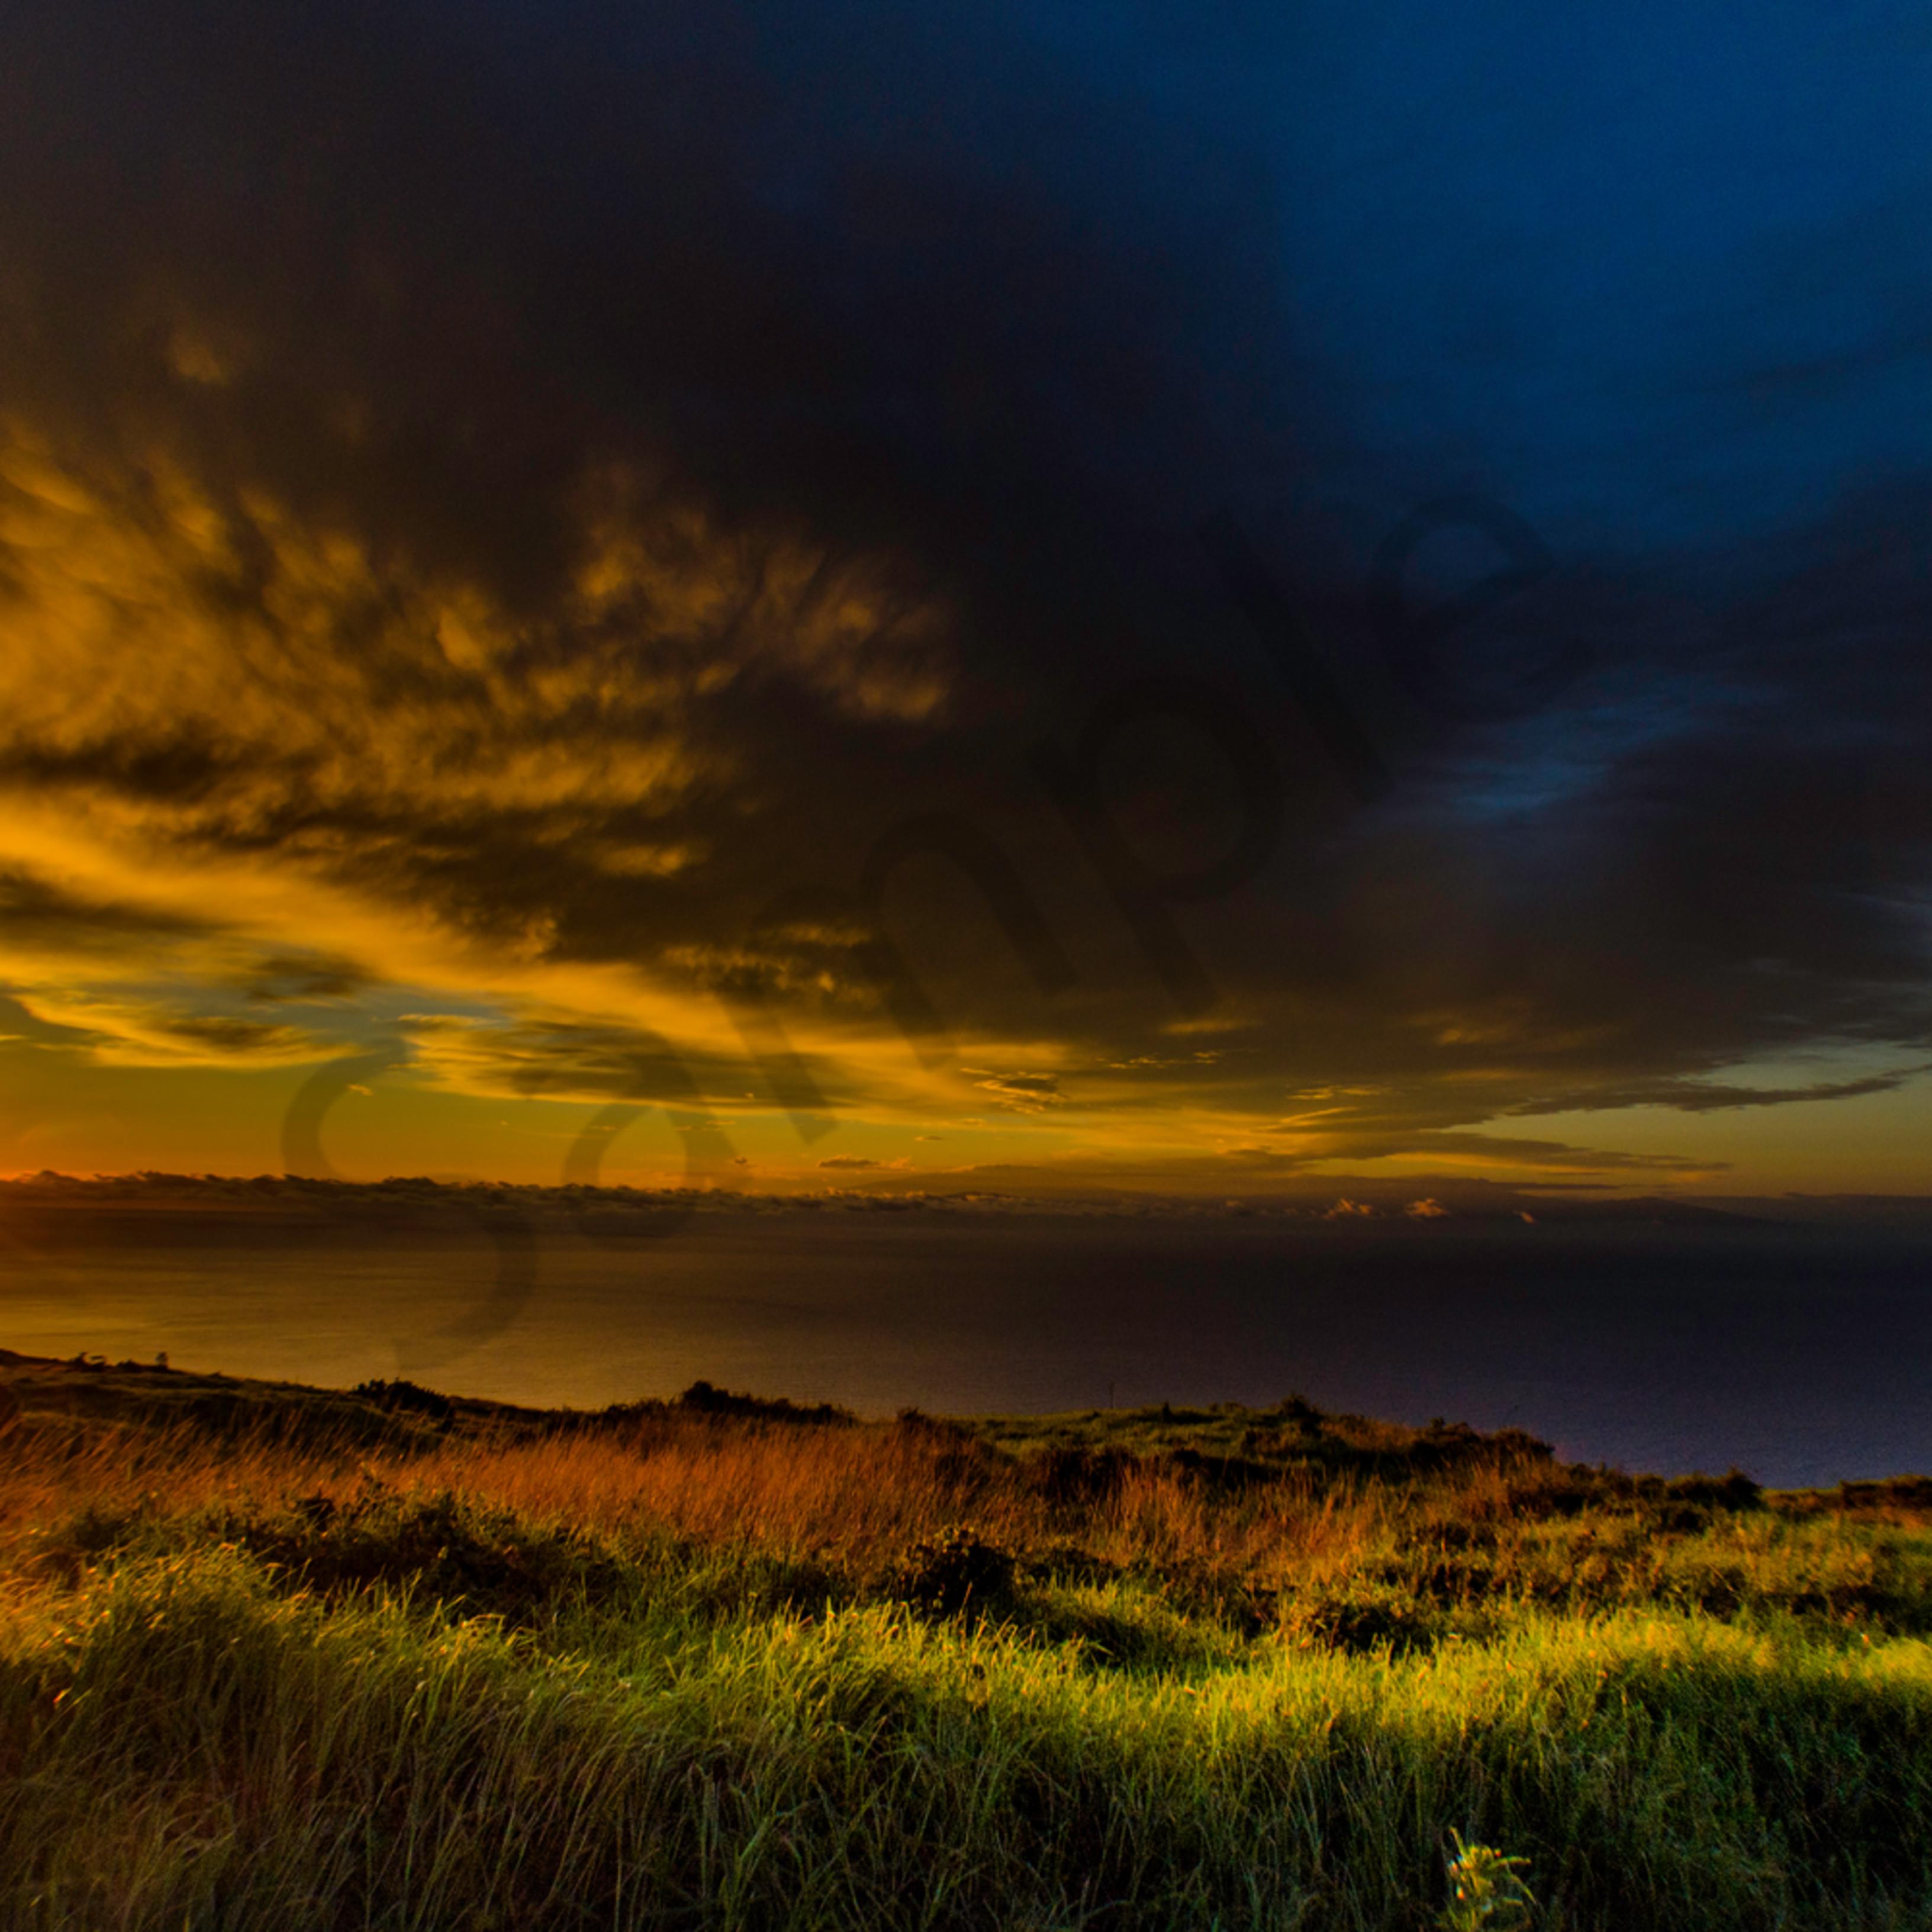 Maui clouds 006 w6cxjm